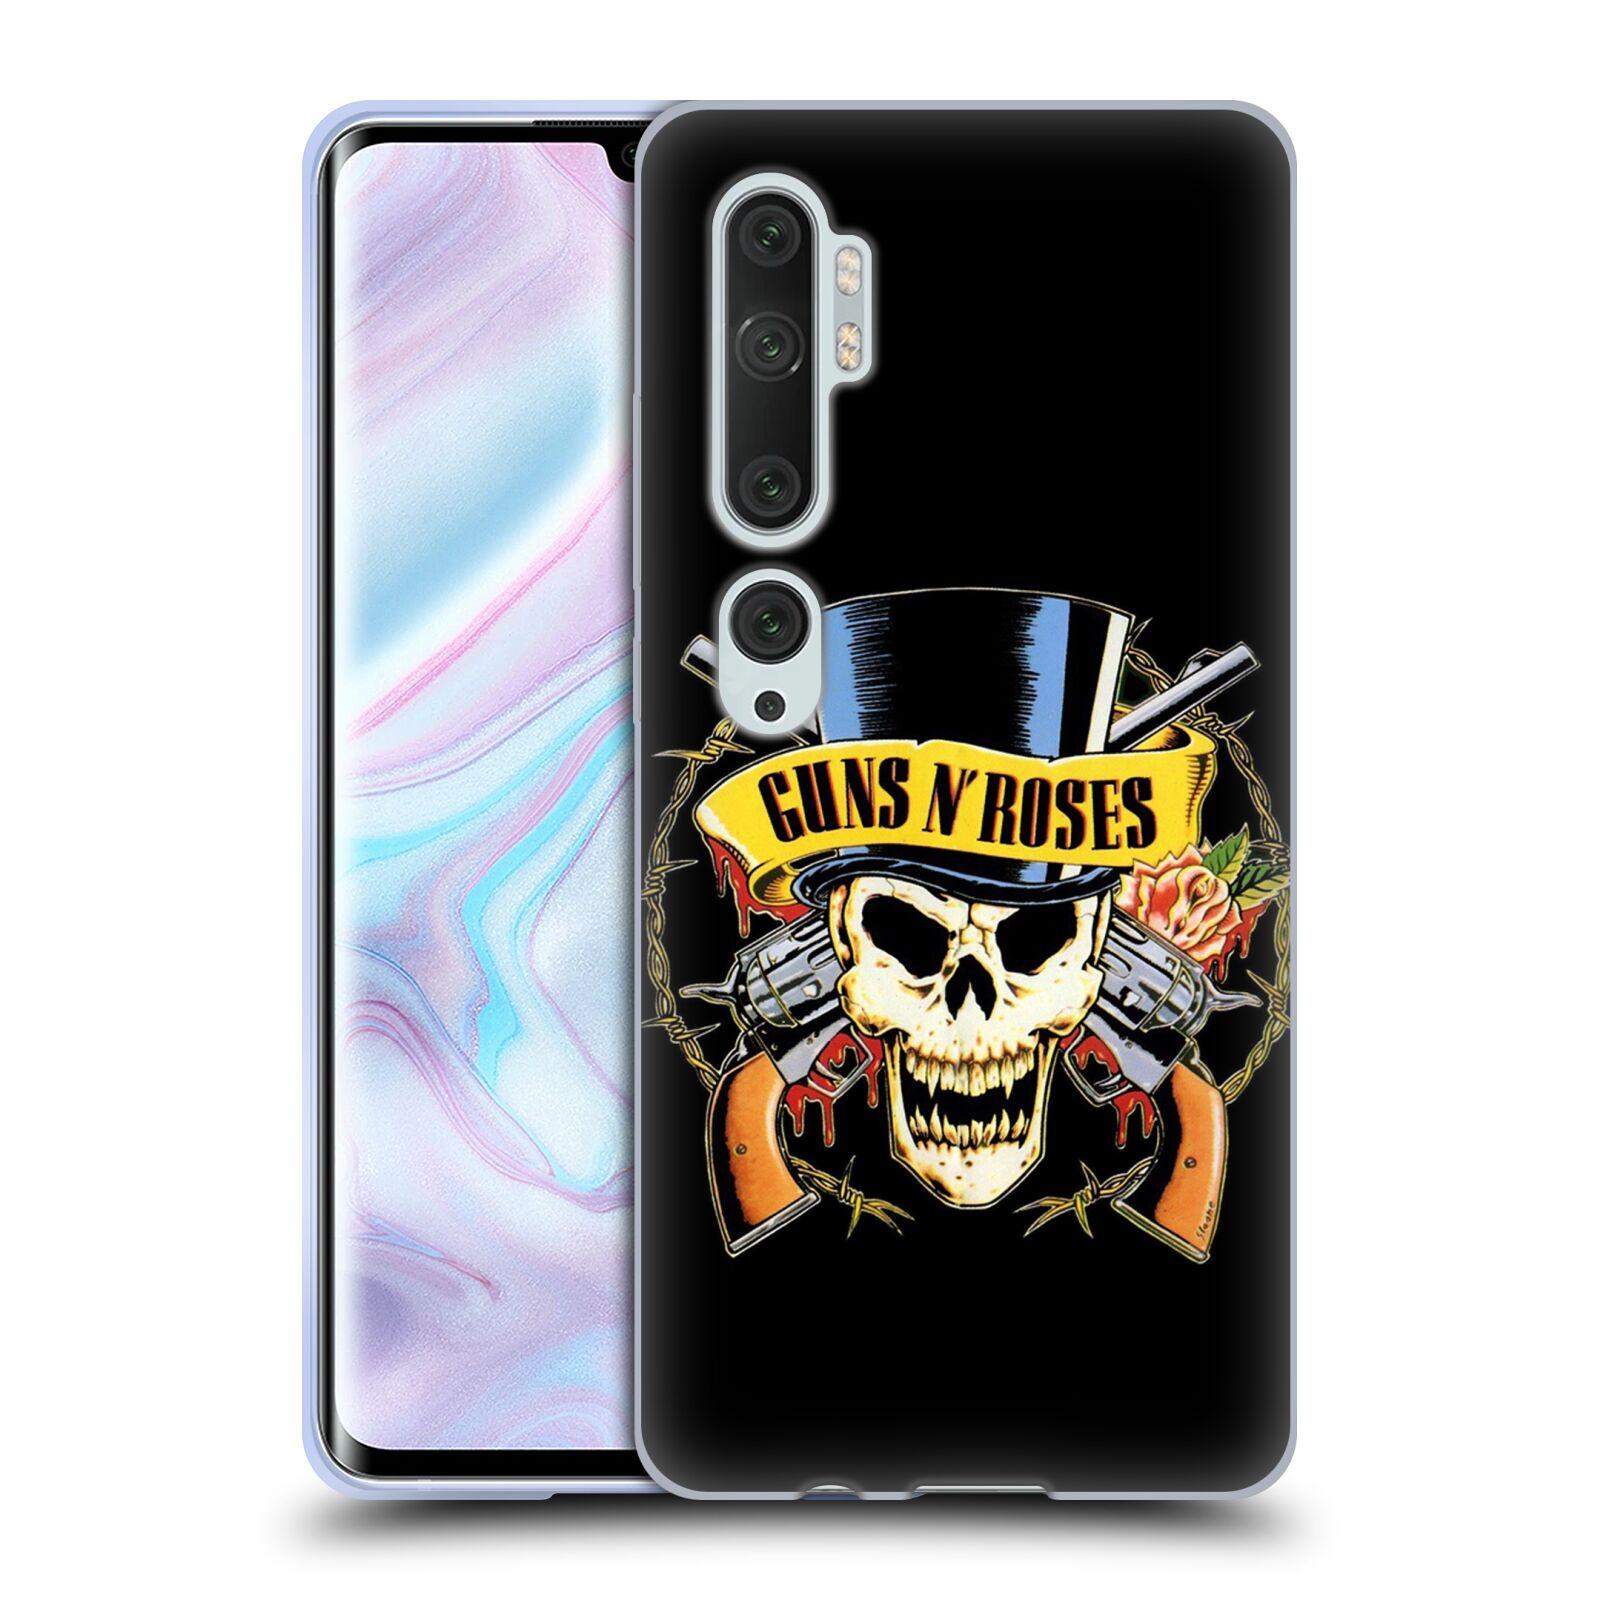 Silikonové pouzdro na mobil Xiaomi Mi Note 10 / 10 Pro - Head Case - Guns N' Roses - Lebka